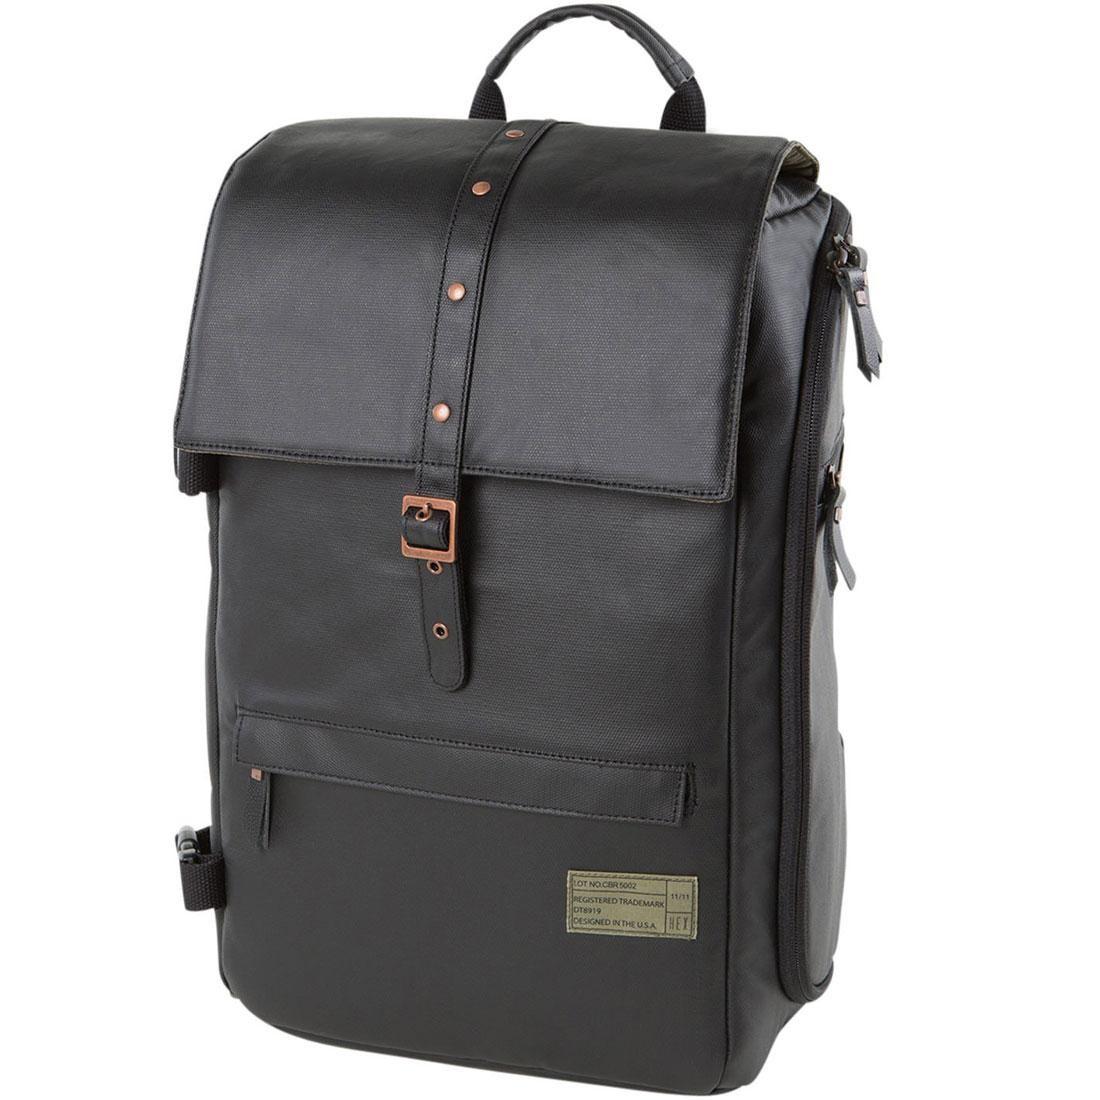 Hex DSLR Photographer Sling Backpack (black)